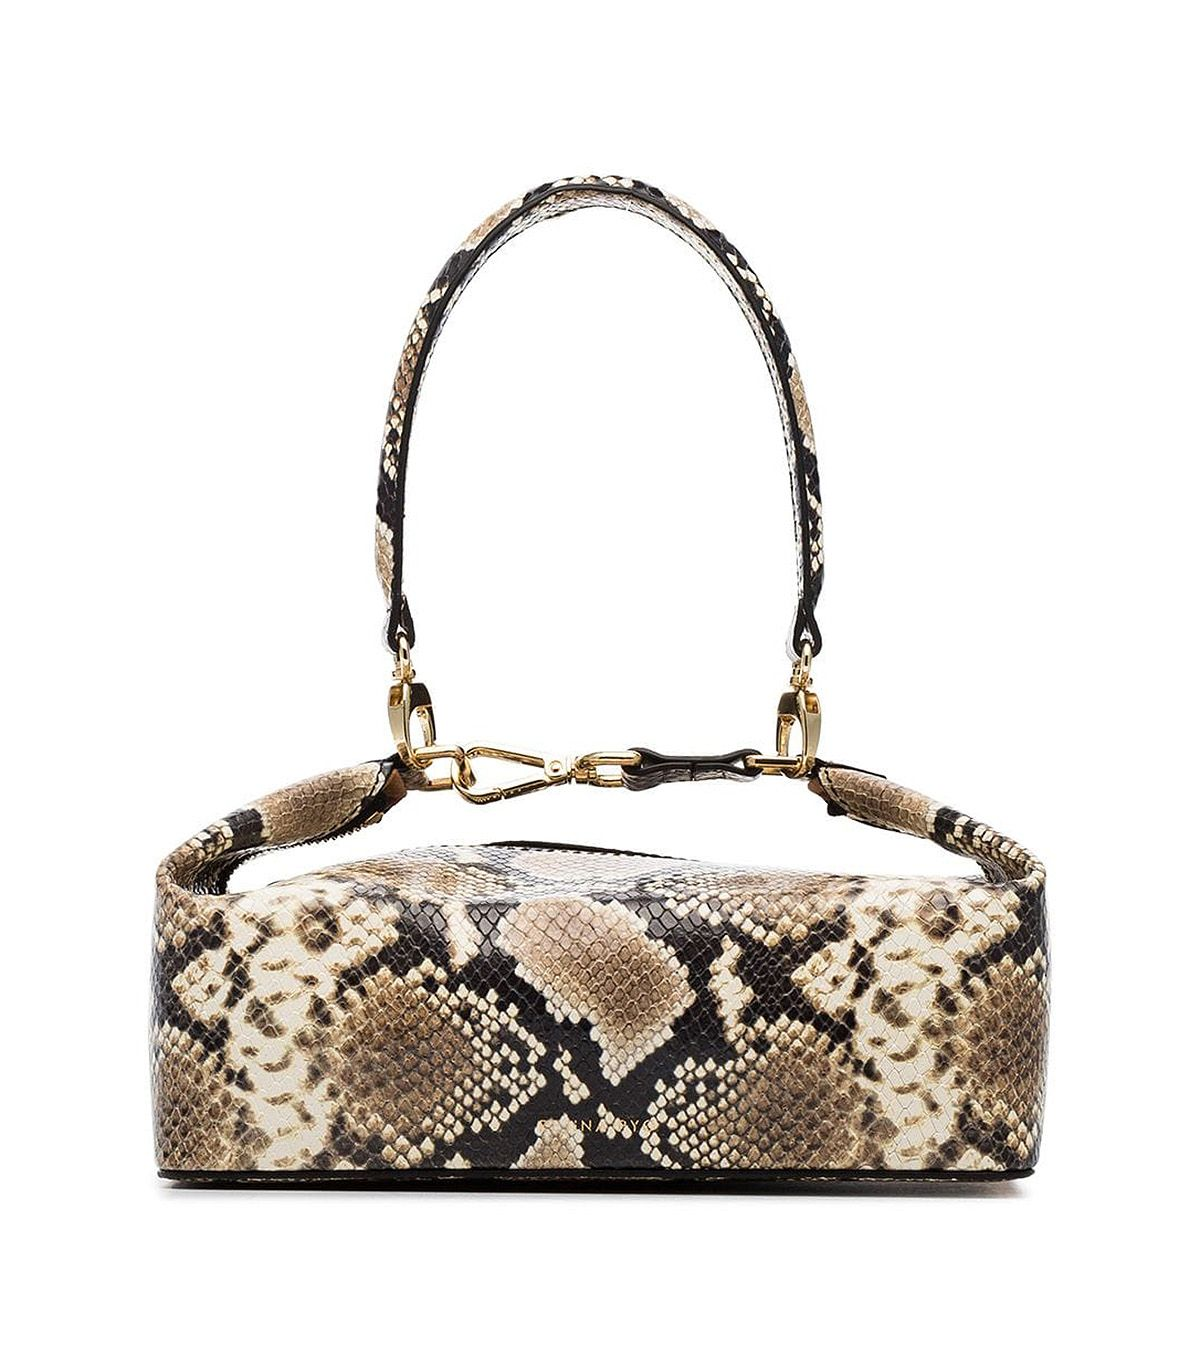 038636b383b4 Best Handbags Winter 2018 - Foto Handbag All Collections ...